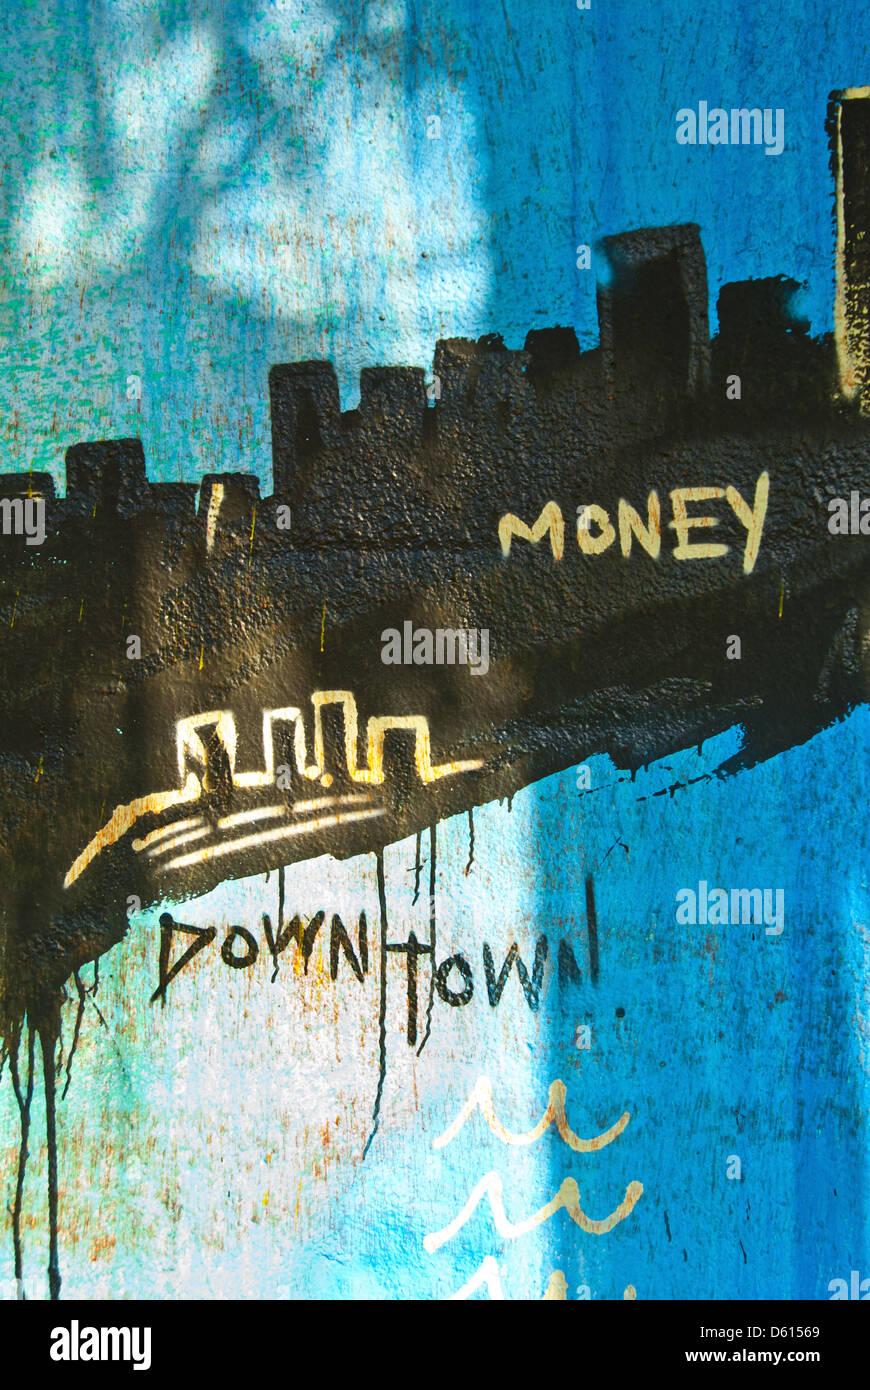 Graffiti wall usa - Graffiti Wall Art In Wynwood Arts District Of Miami Florida Usa